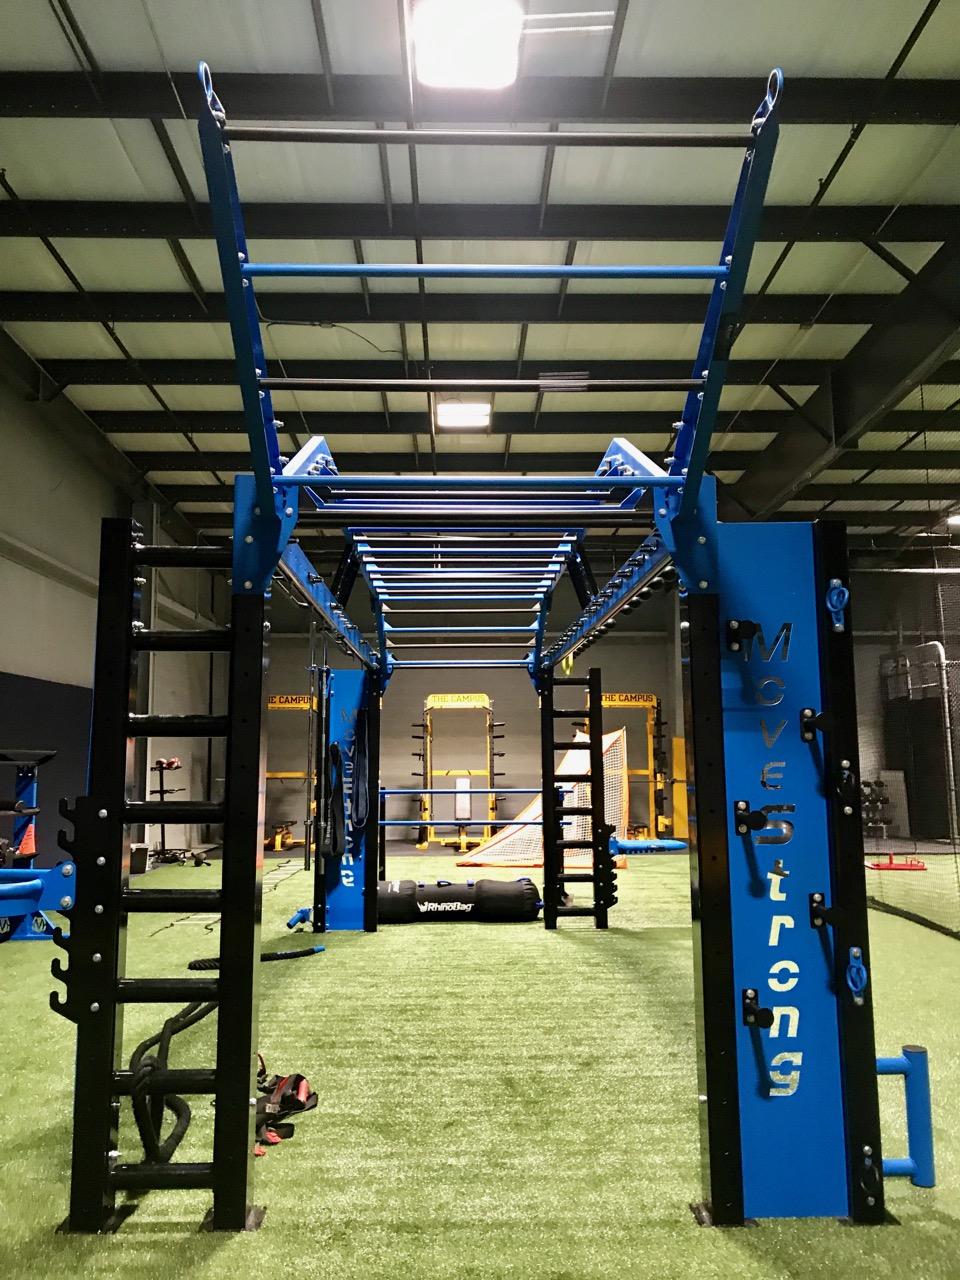 Fitness Gym Rack Station Nova XL